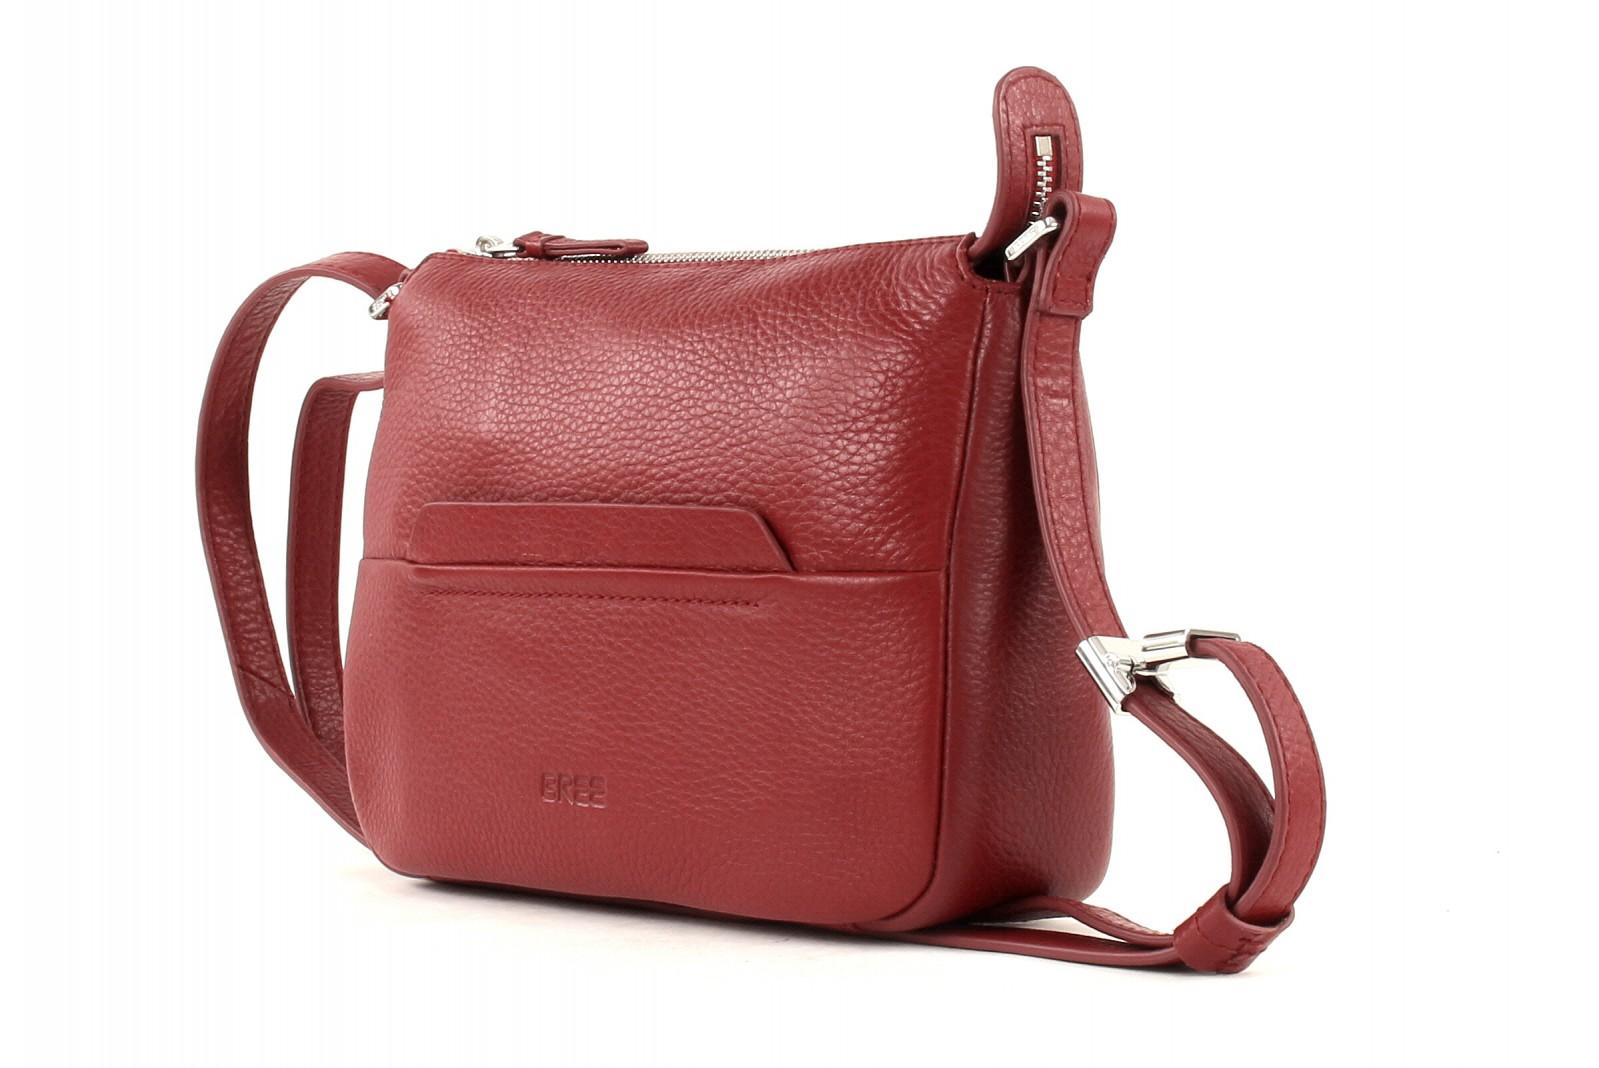 Bree Cross Body Bag Faro 1 Shoulder S Brick Red